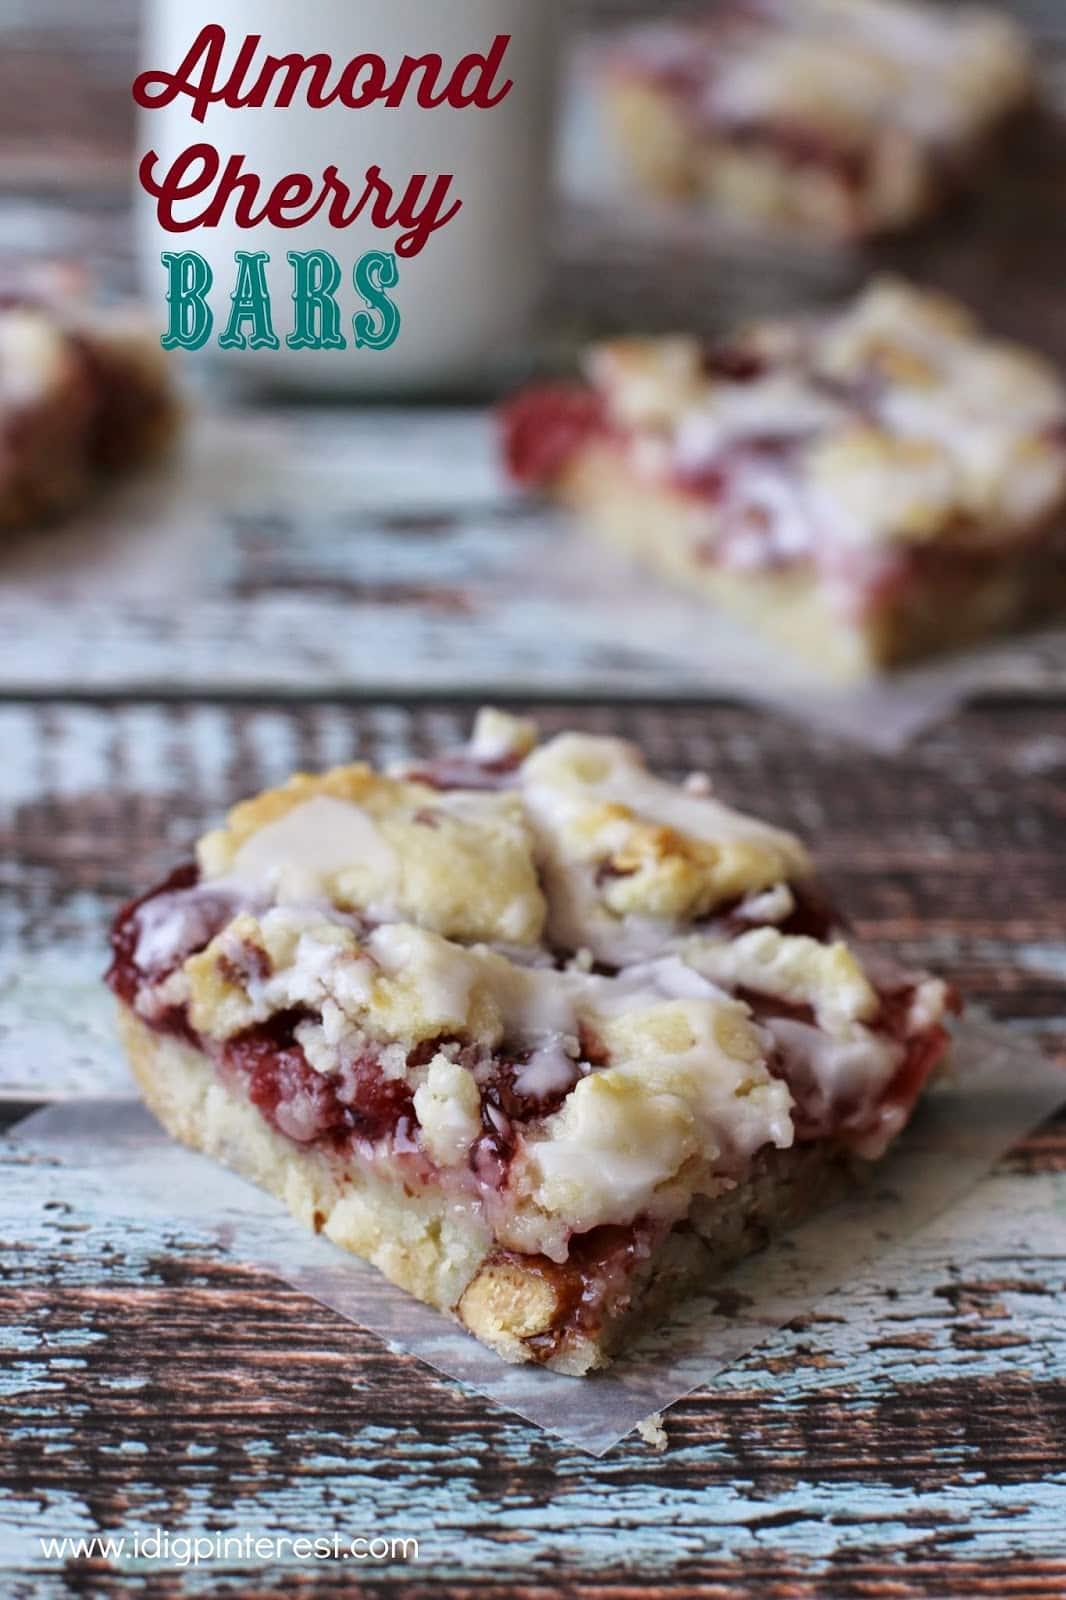 Almond Cherry Bars3